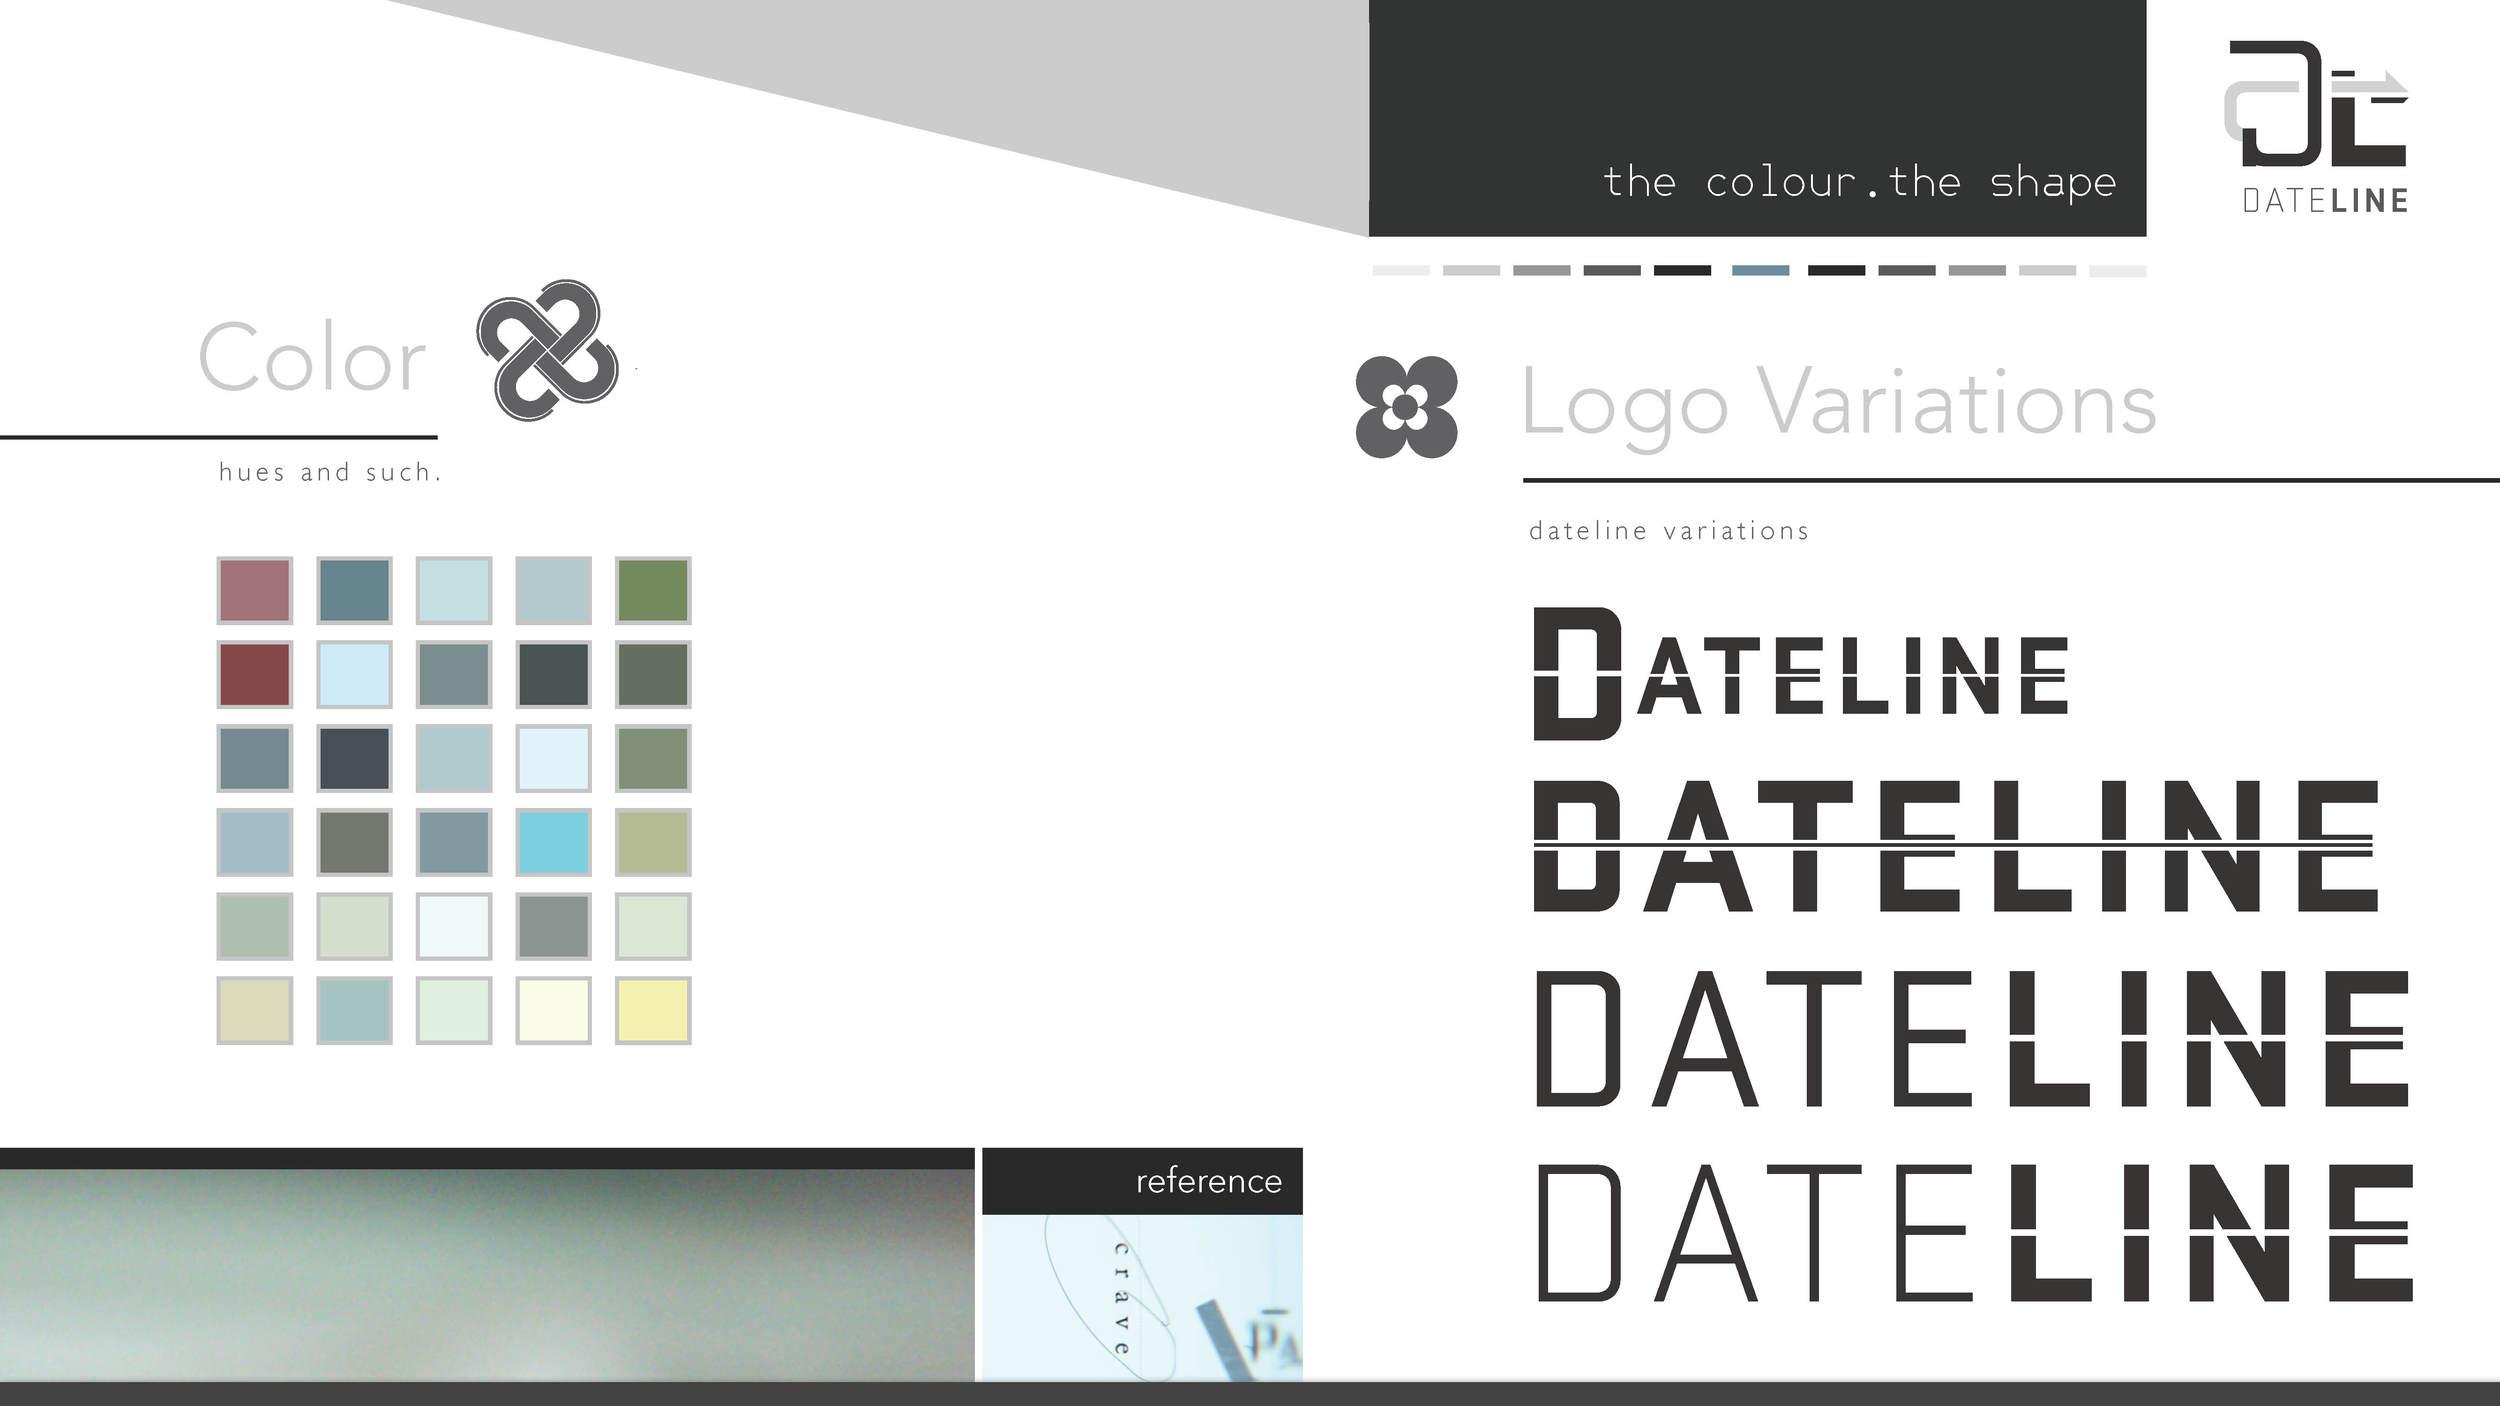 Dateline_Book_Page_28.jpg